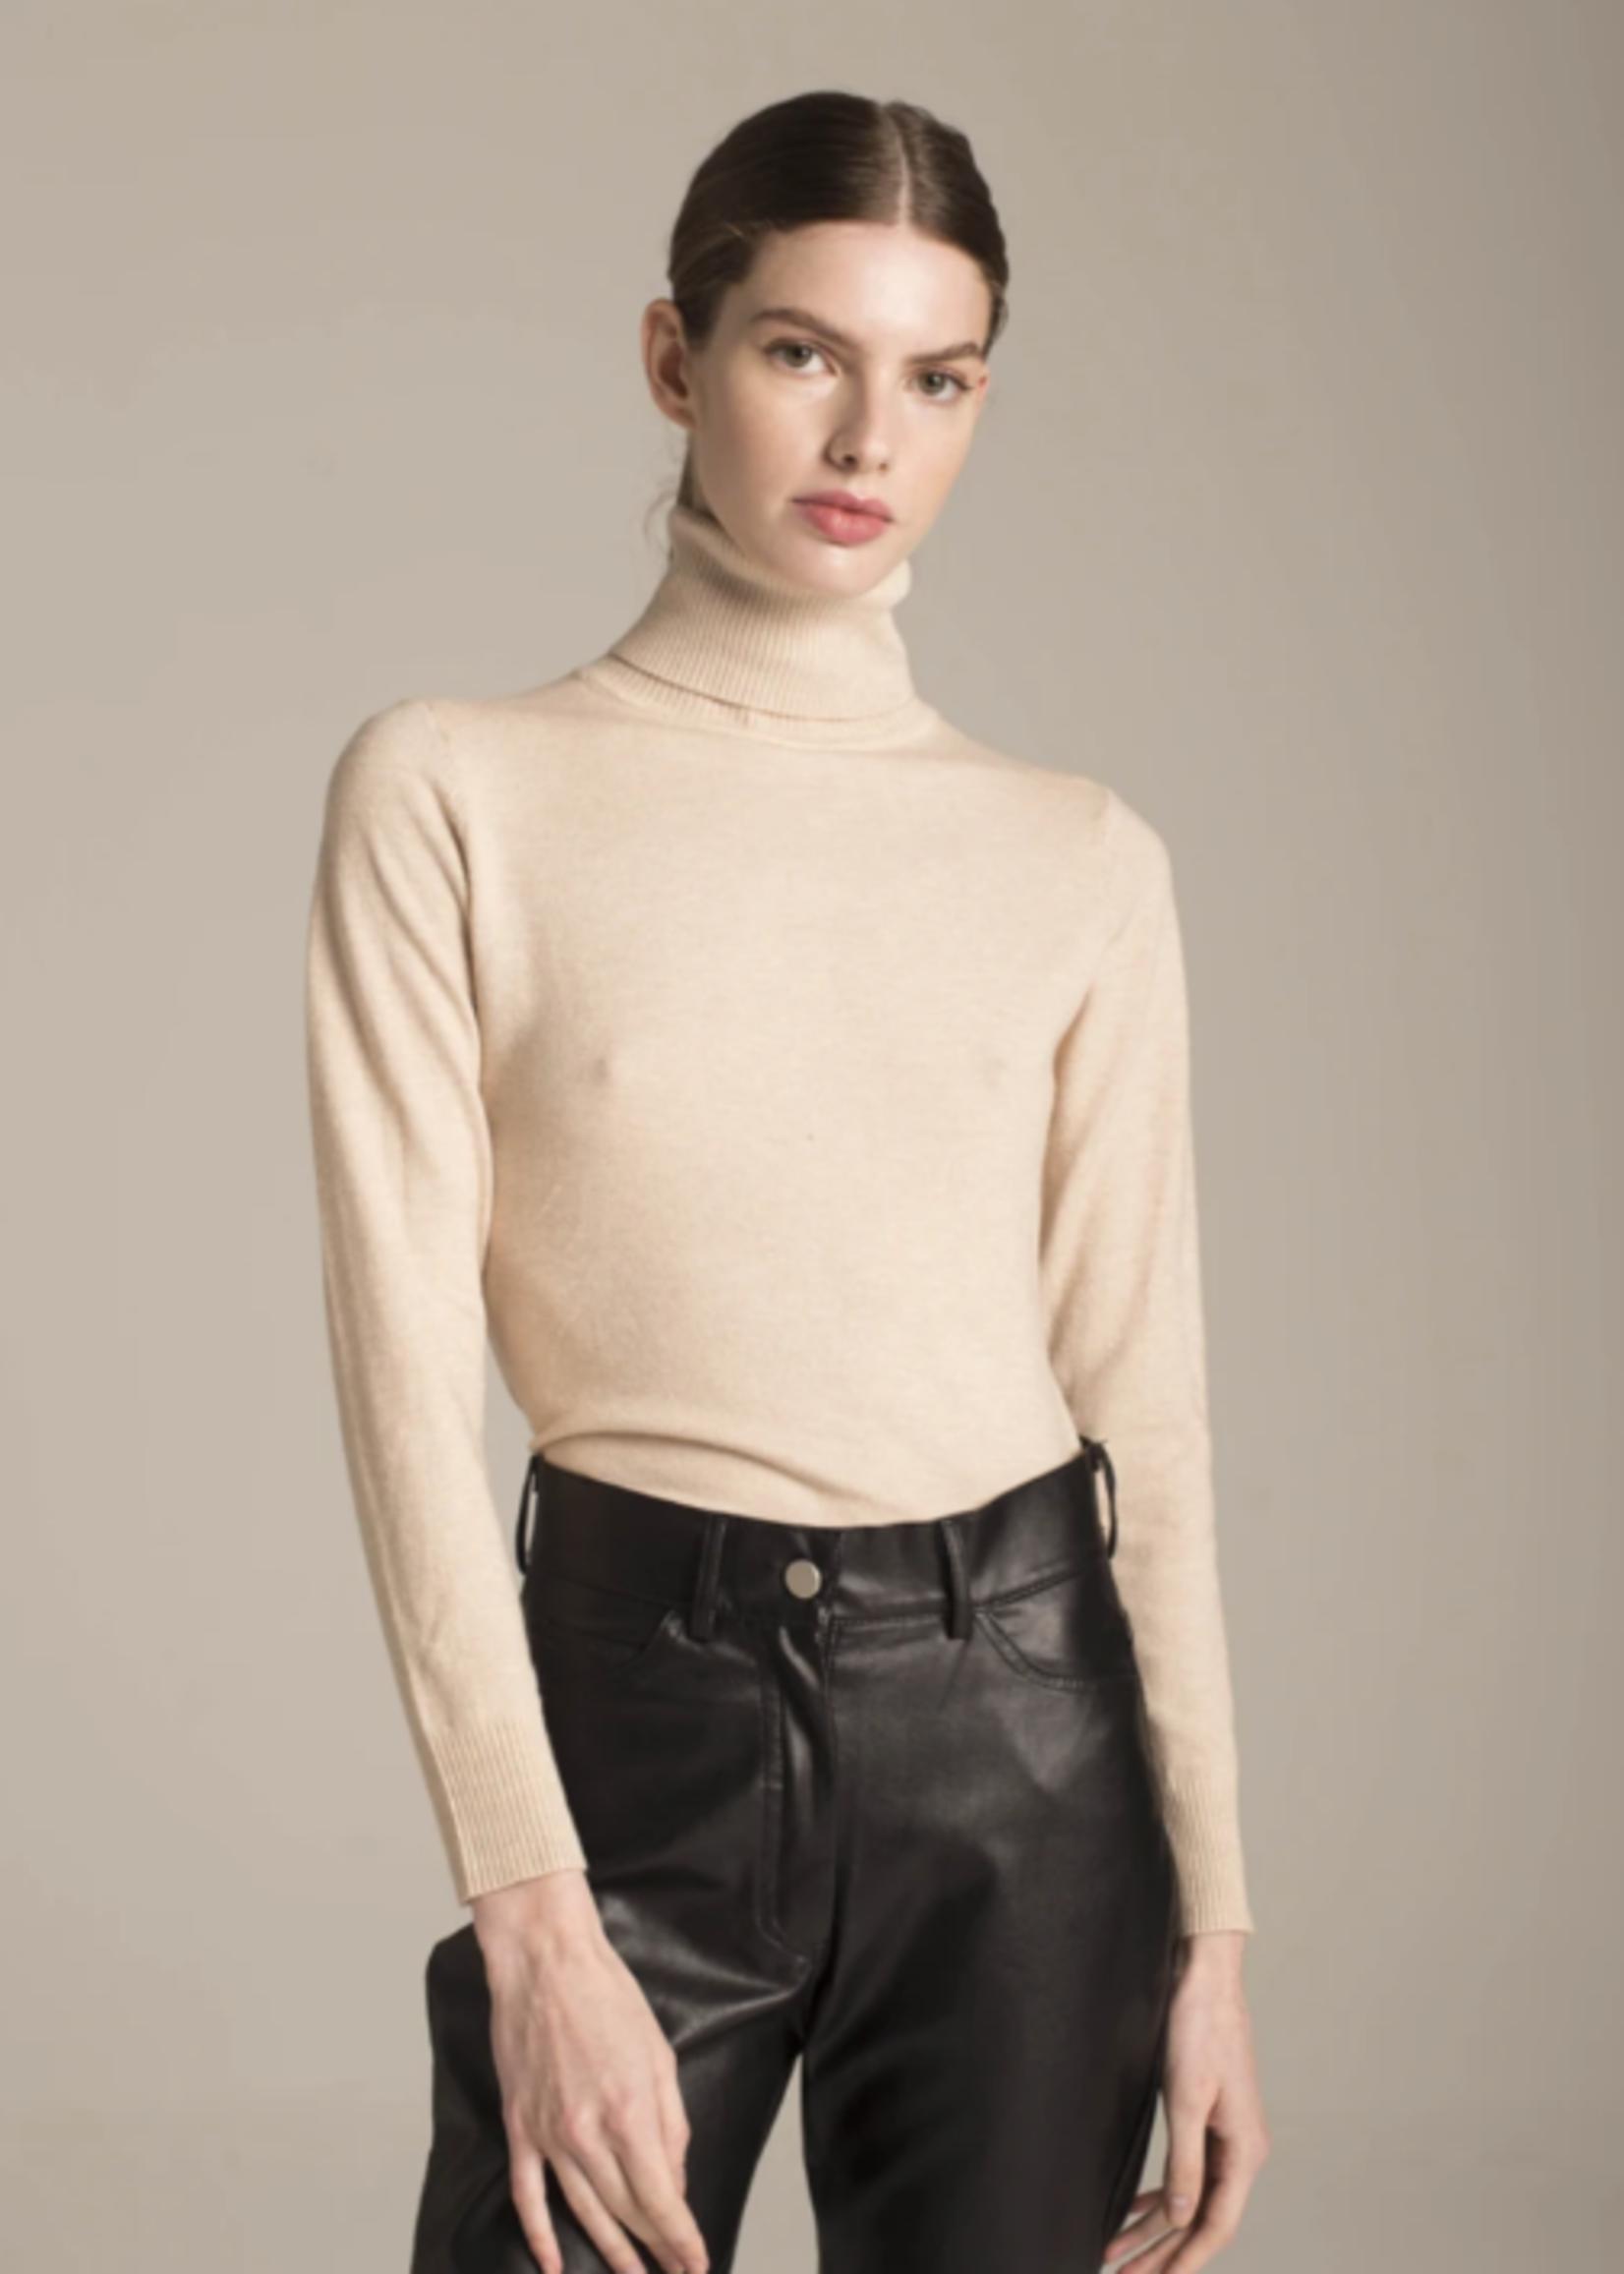 Deluc Silene Sweater - Sand